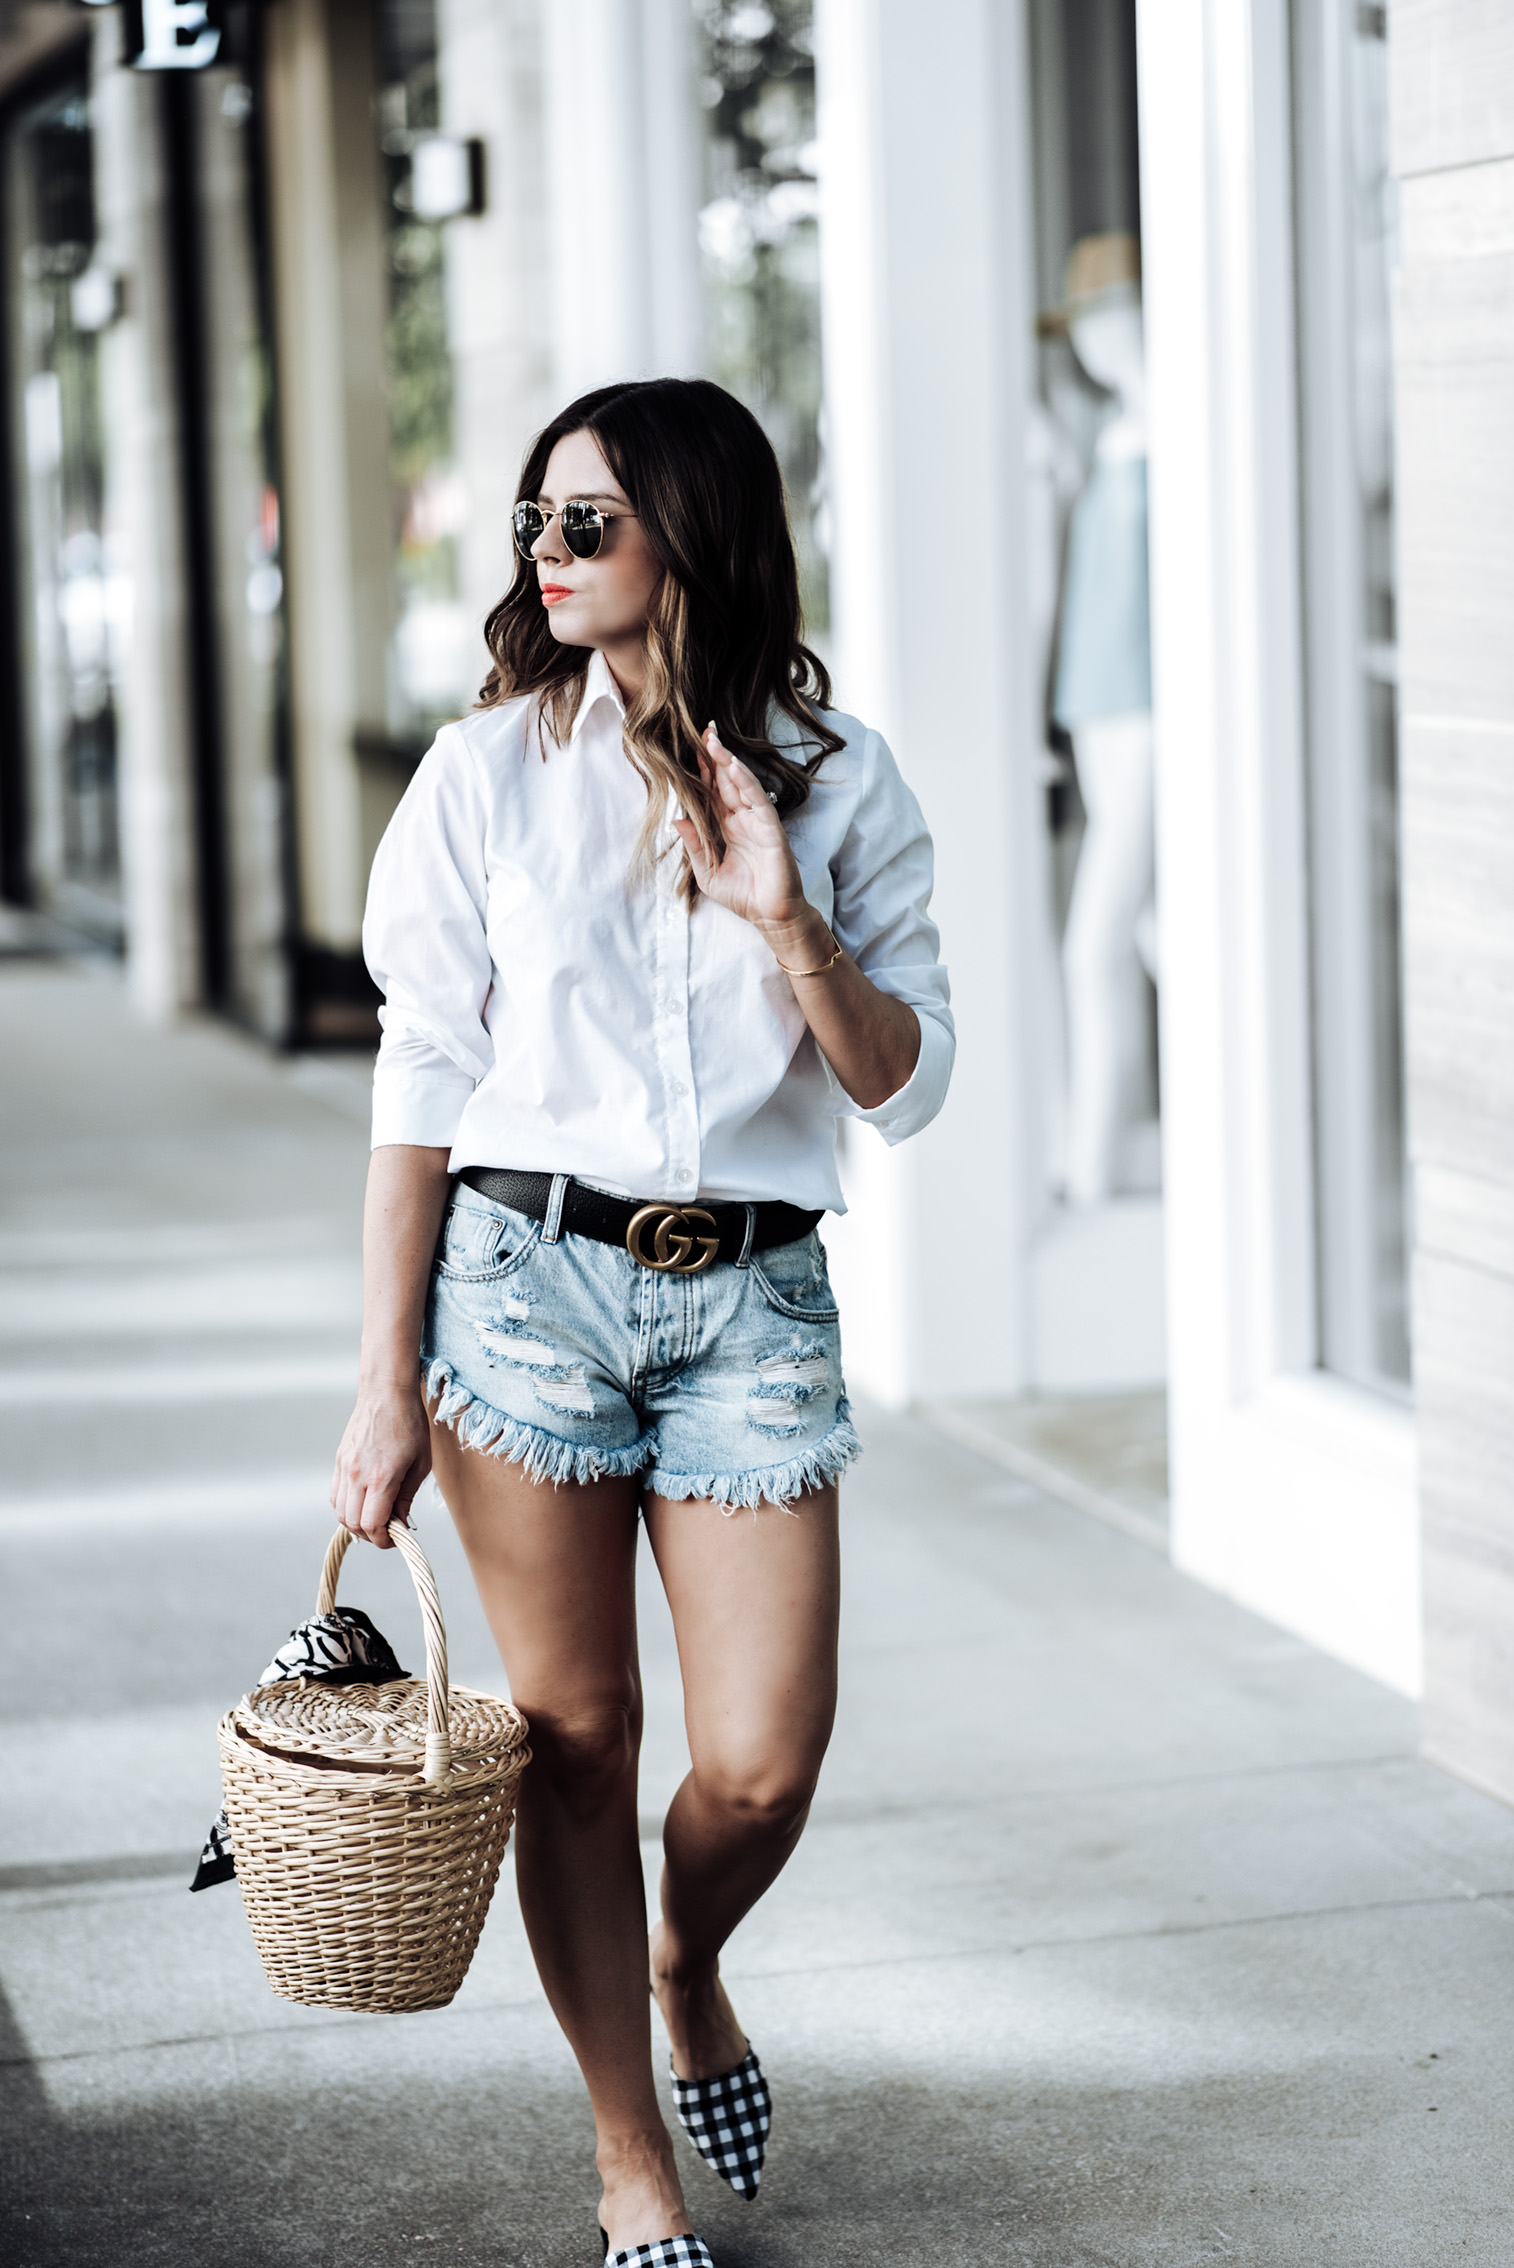 Tiffany Jais Houston fashion blogger | Gucci double g belt | White button down top | One Teaspoon shorts | Straw basket handbag | Streetstyle outfit ideas 2017 Gingham flats